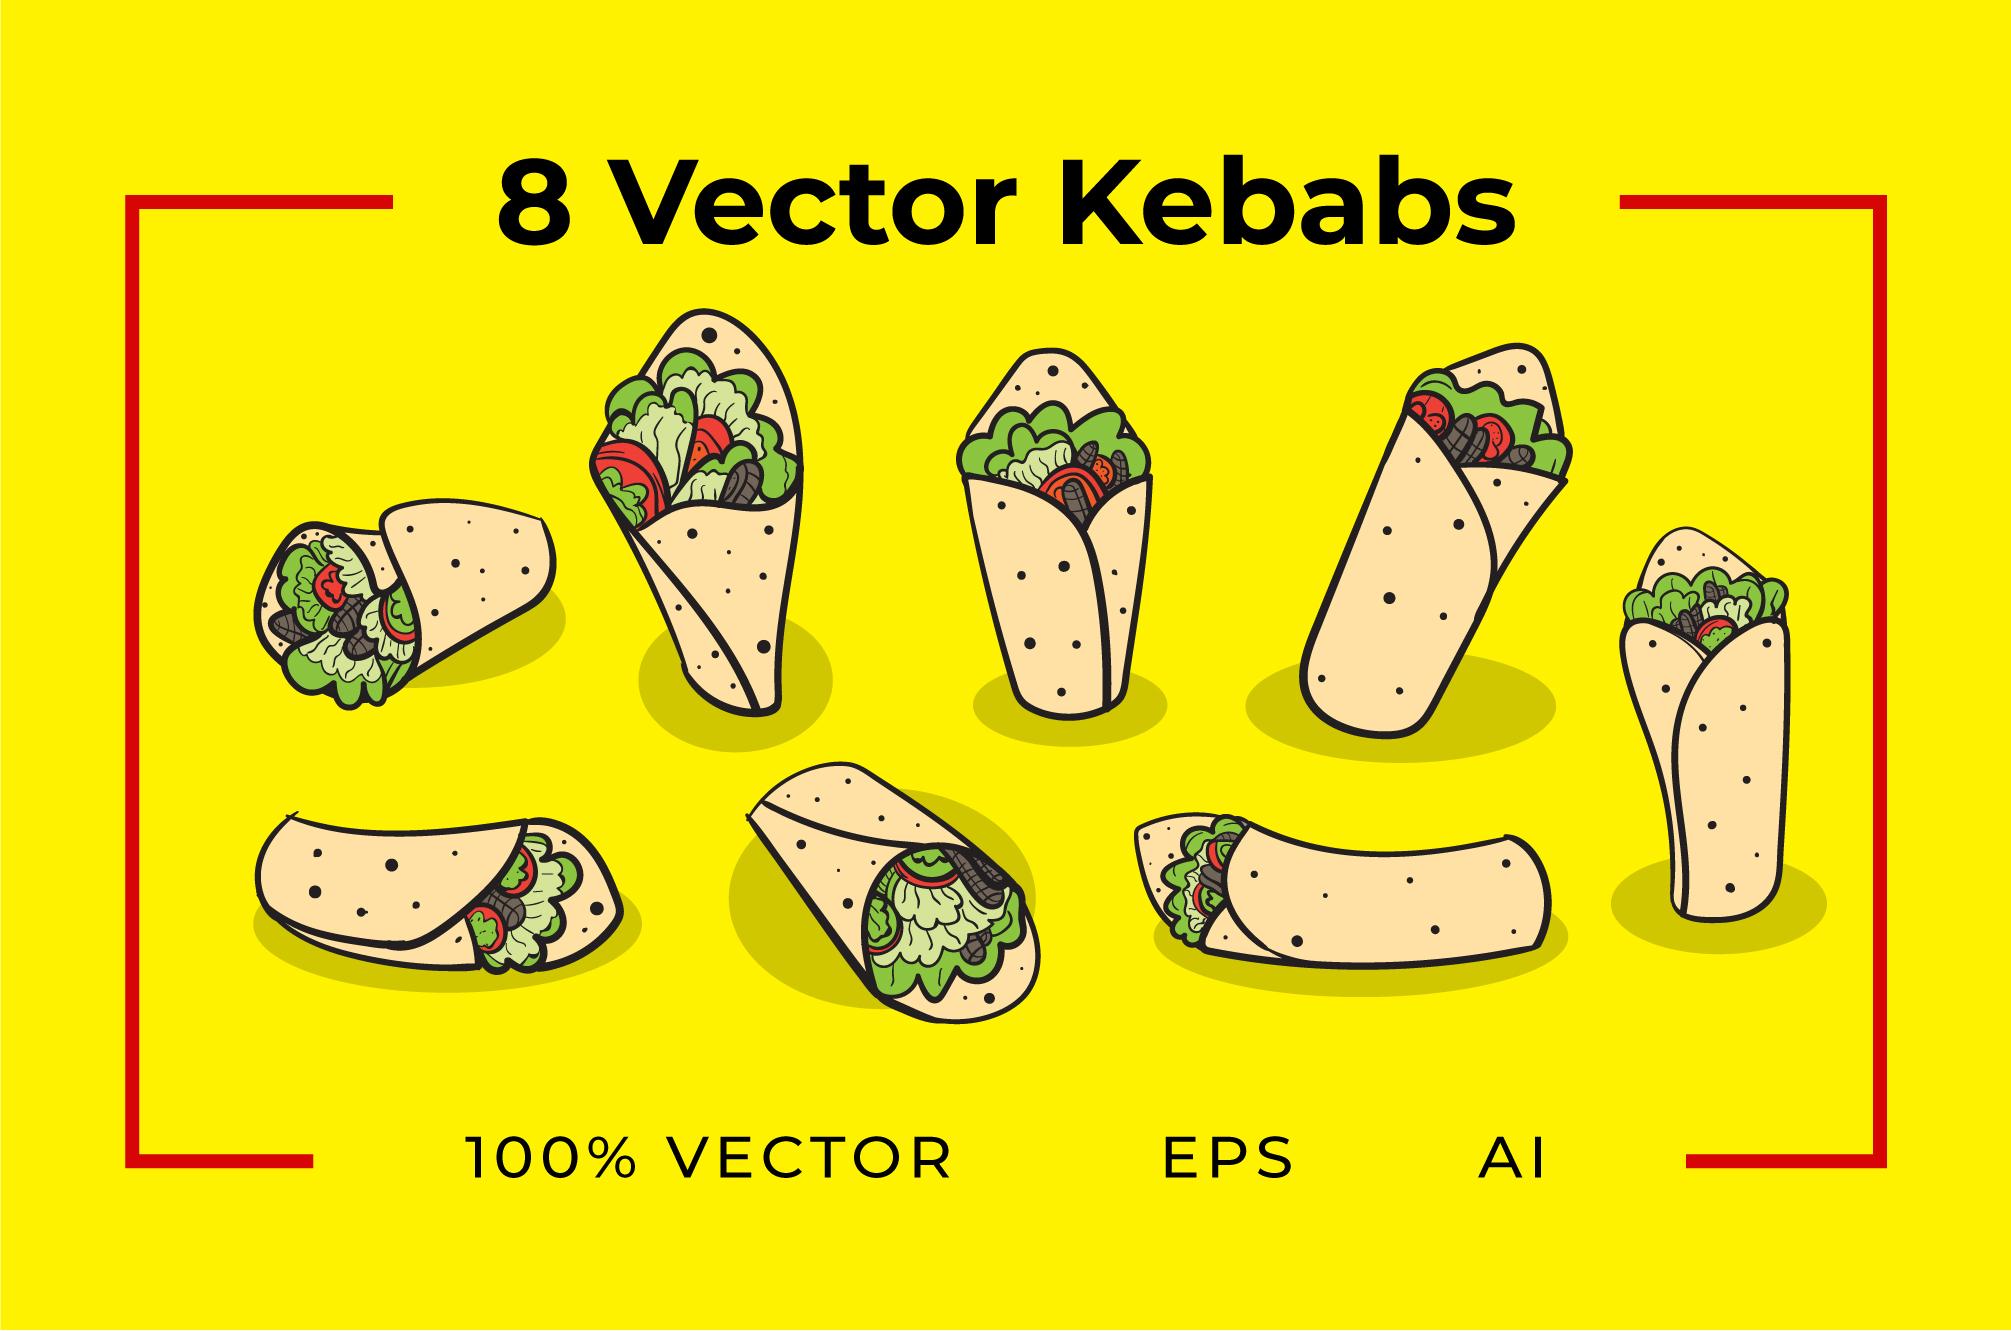 8 Kebab Vectors example image 1